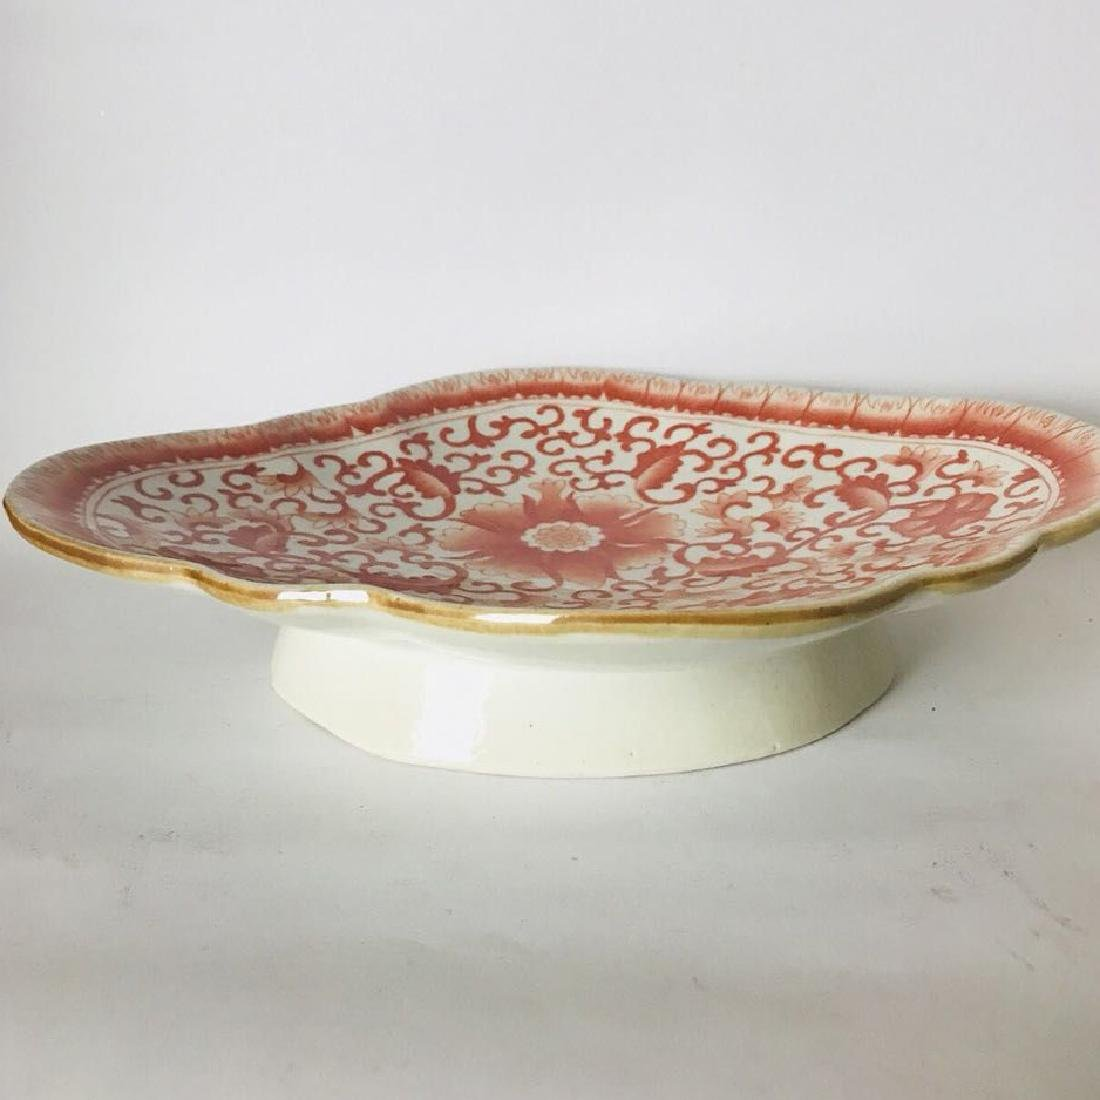 Red Underglazed Porcelain Plate